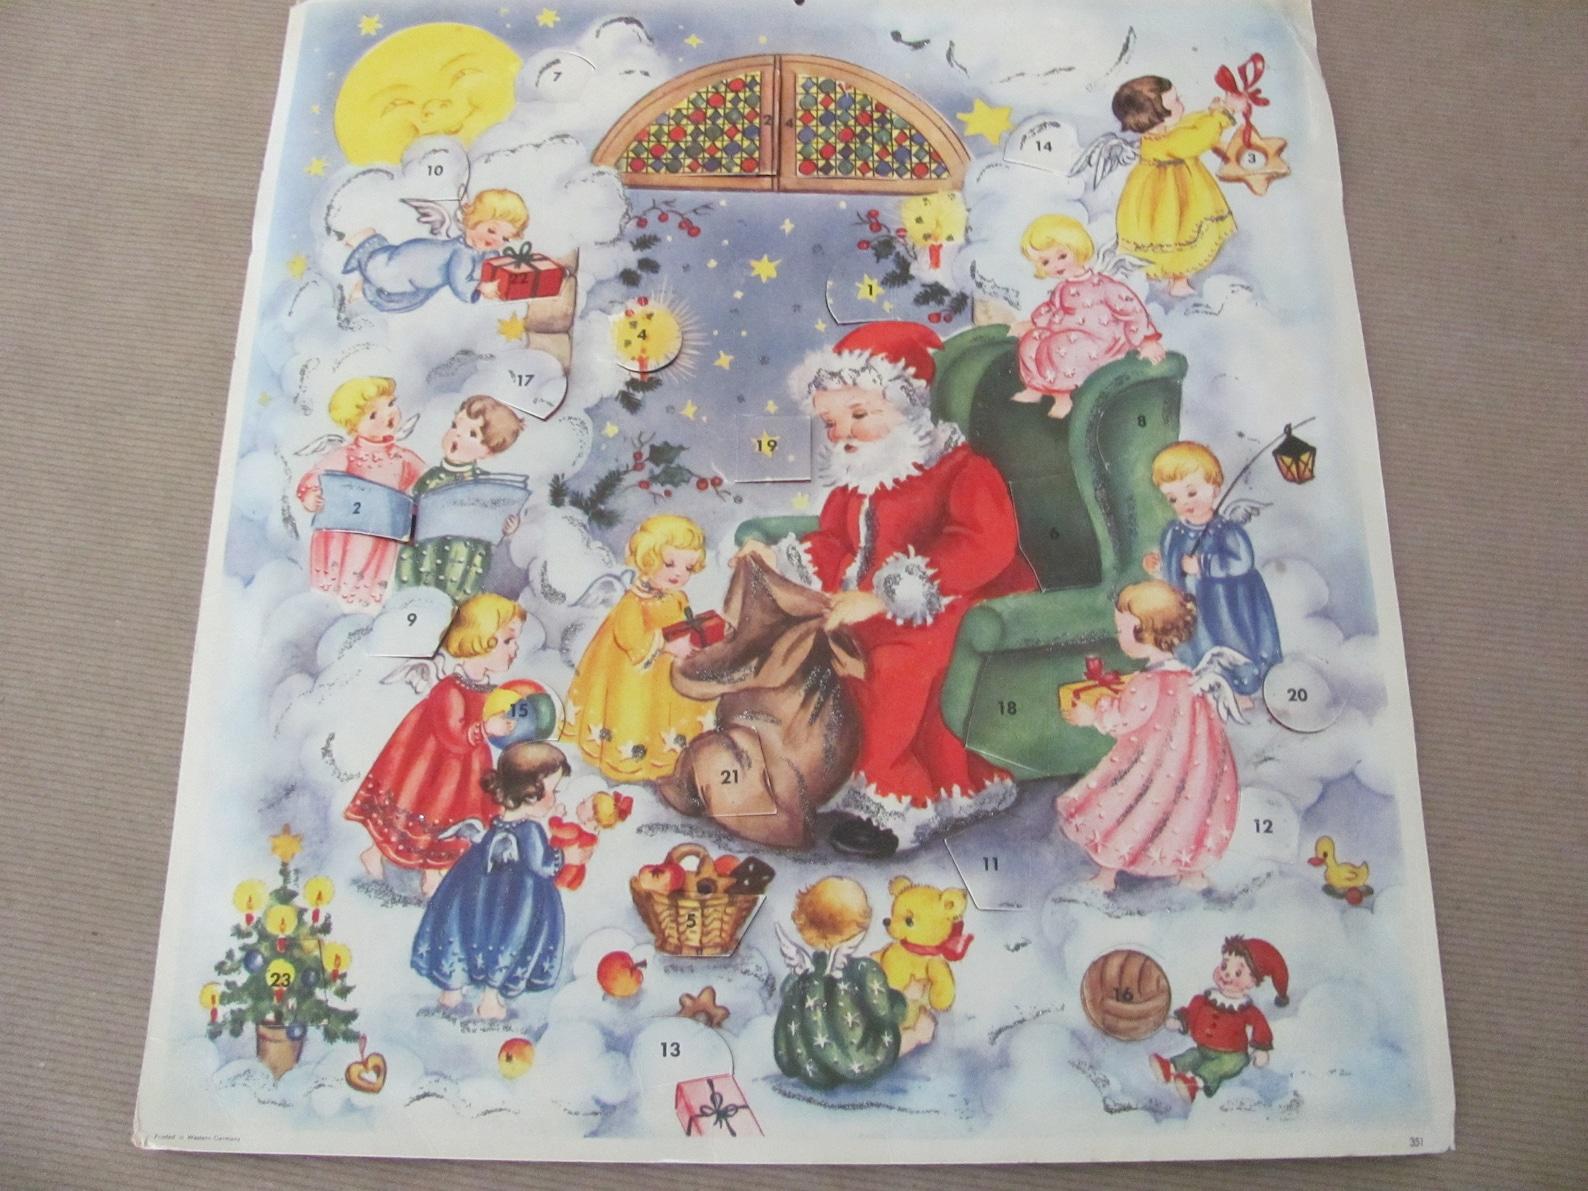 Vintage Christmas Advent Calendar, 1950's Santa Paper Advent Calender, West Germany, 1950's Christmas Decor